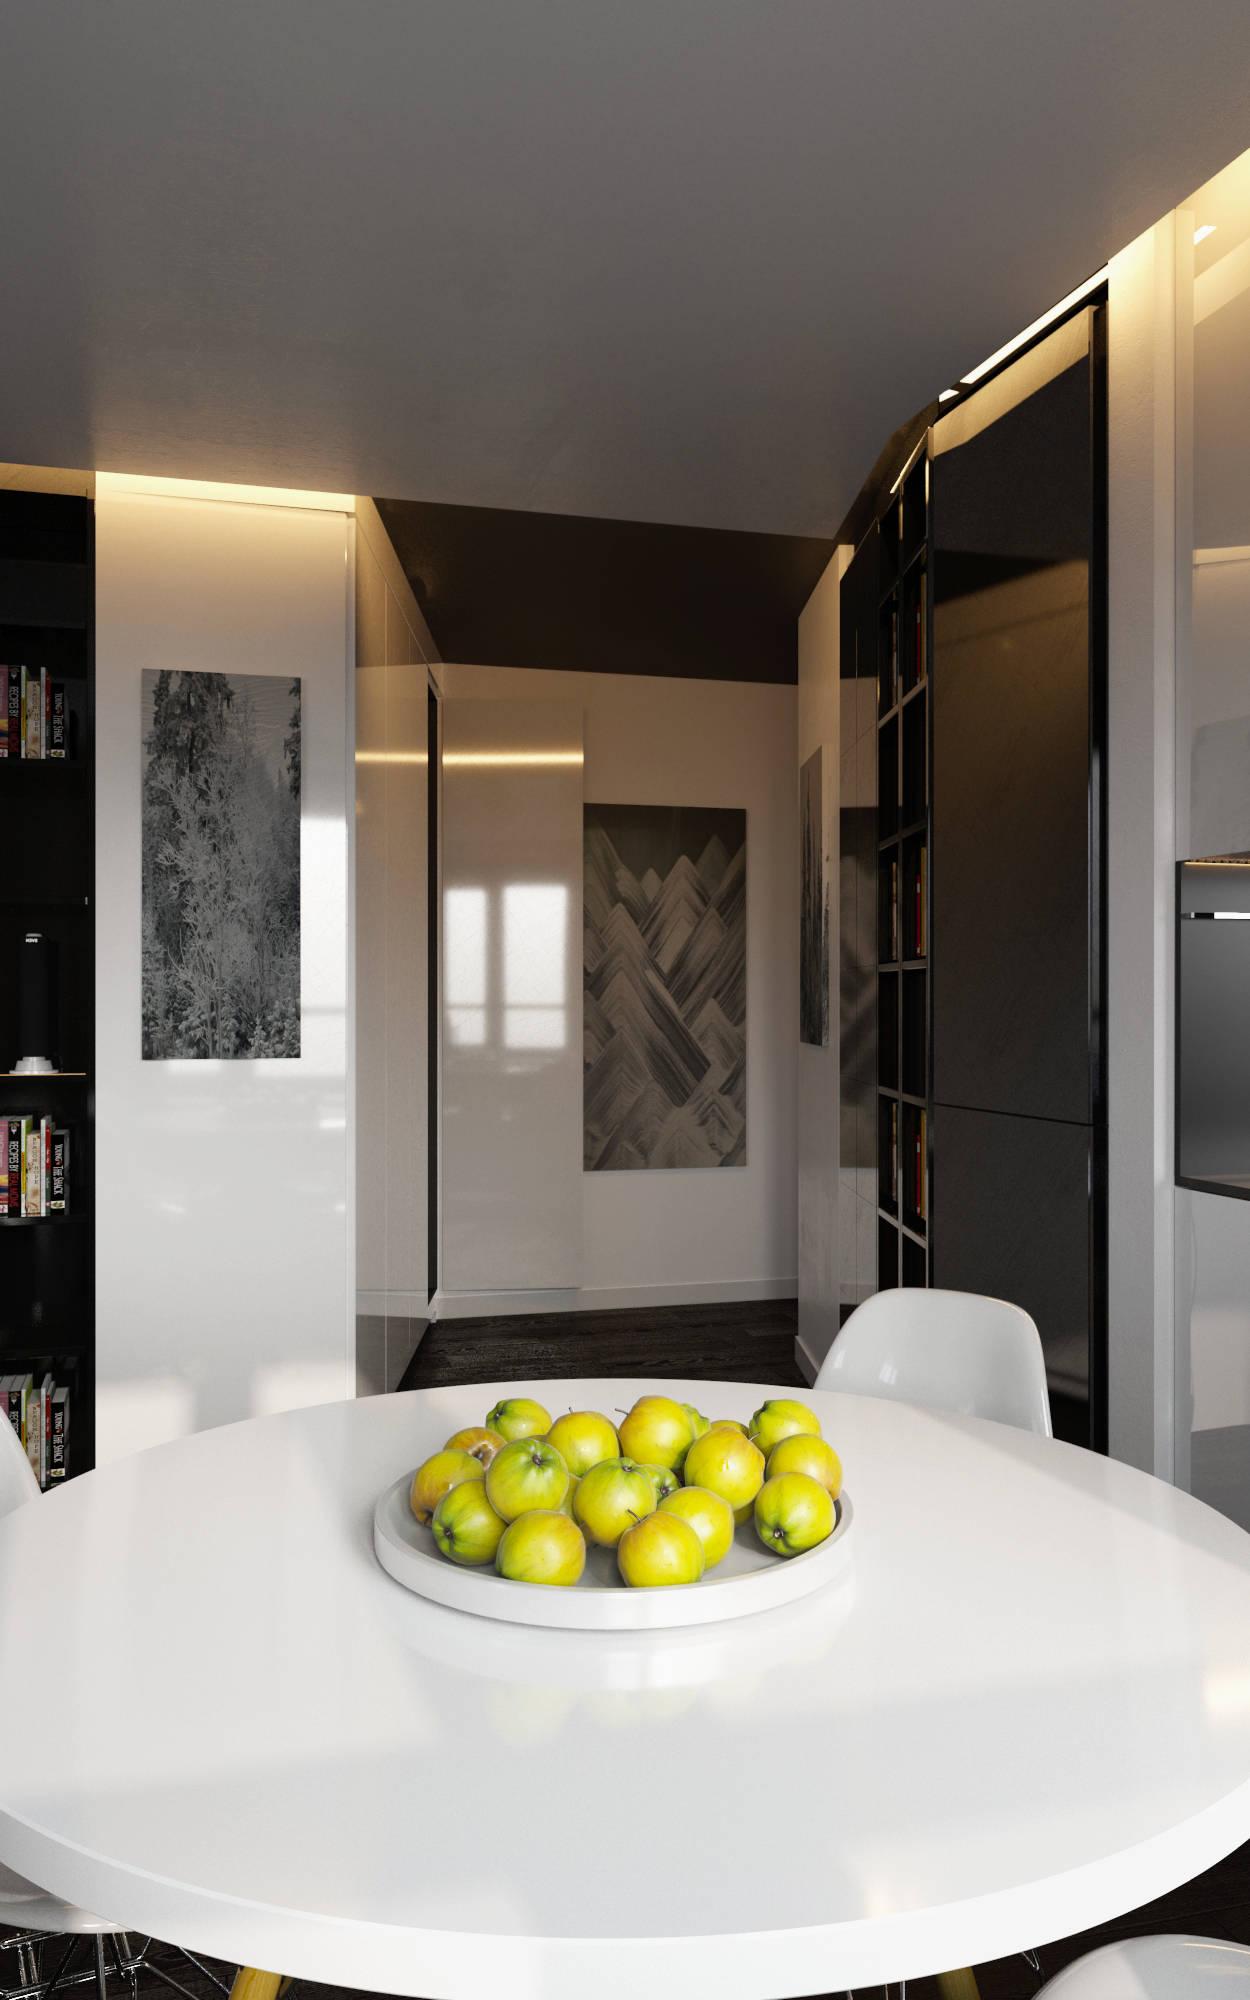 Kitchen&apples&coffee